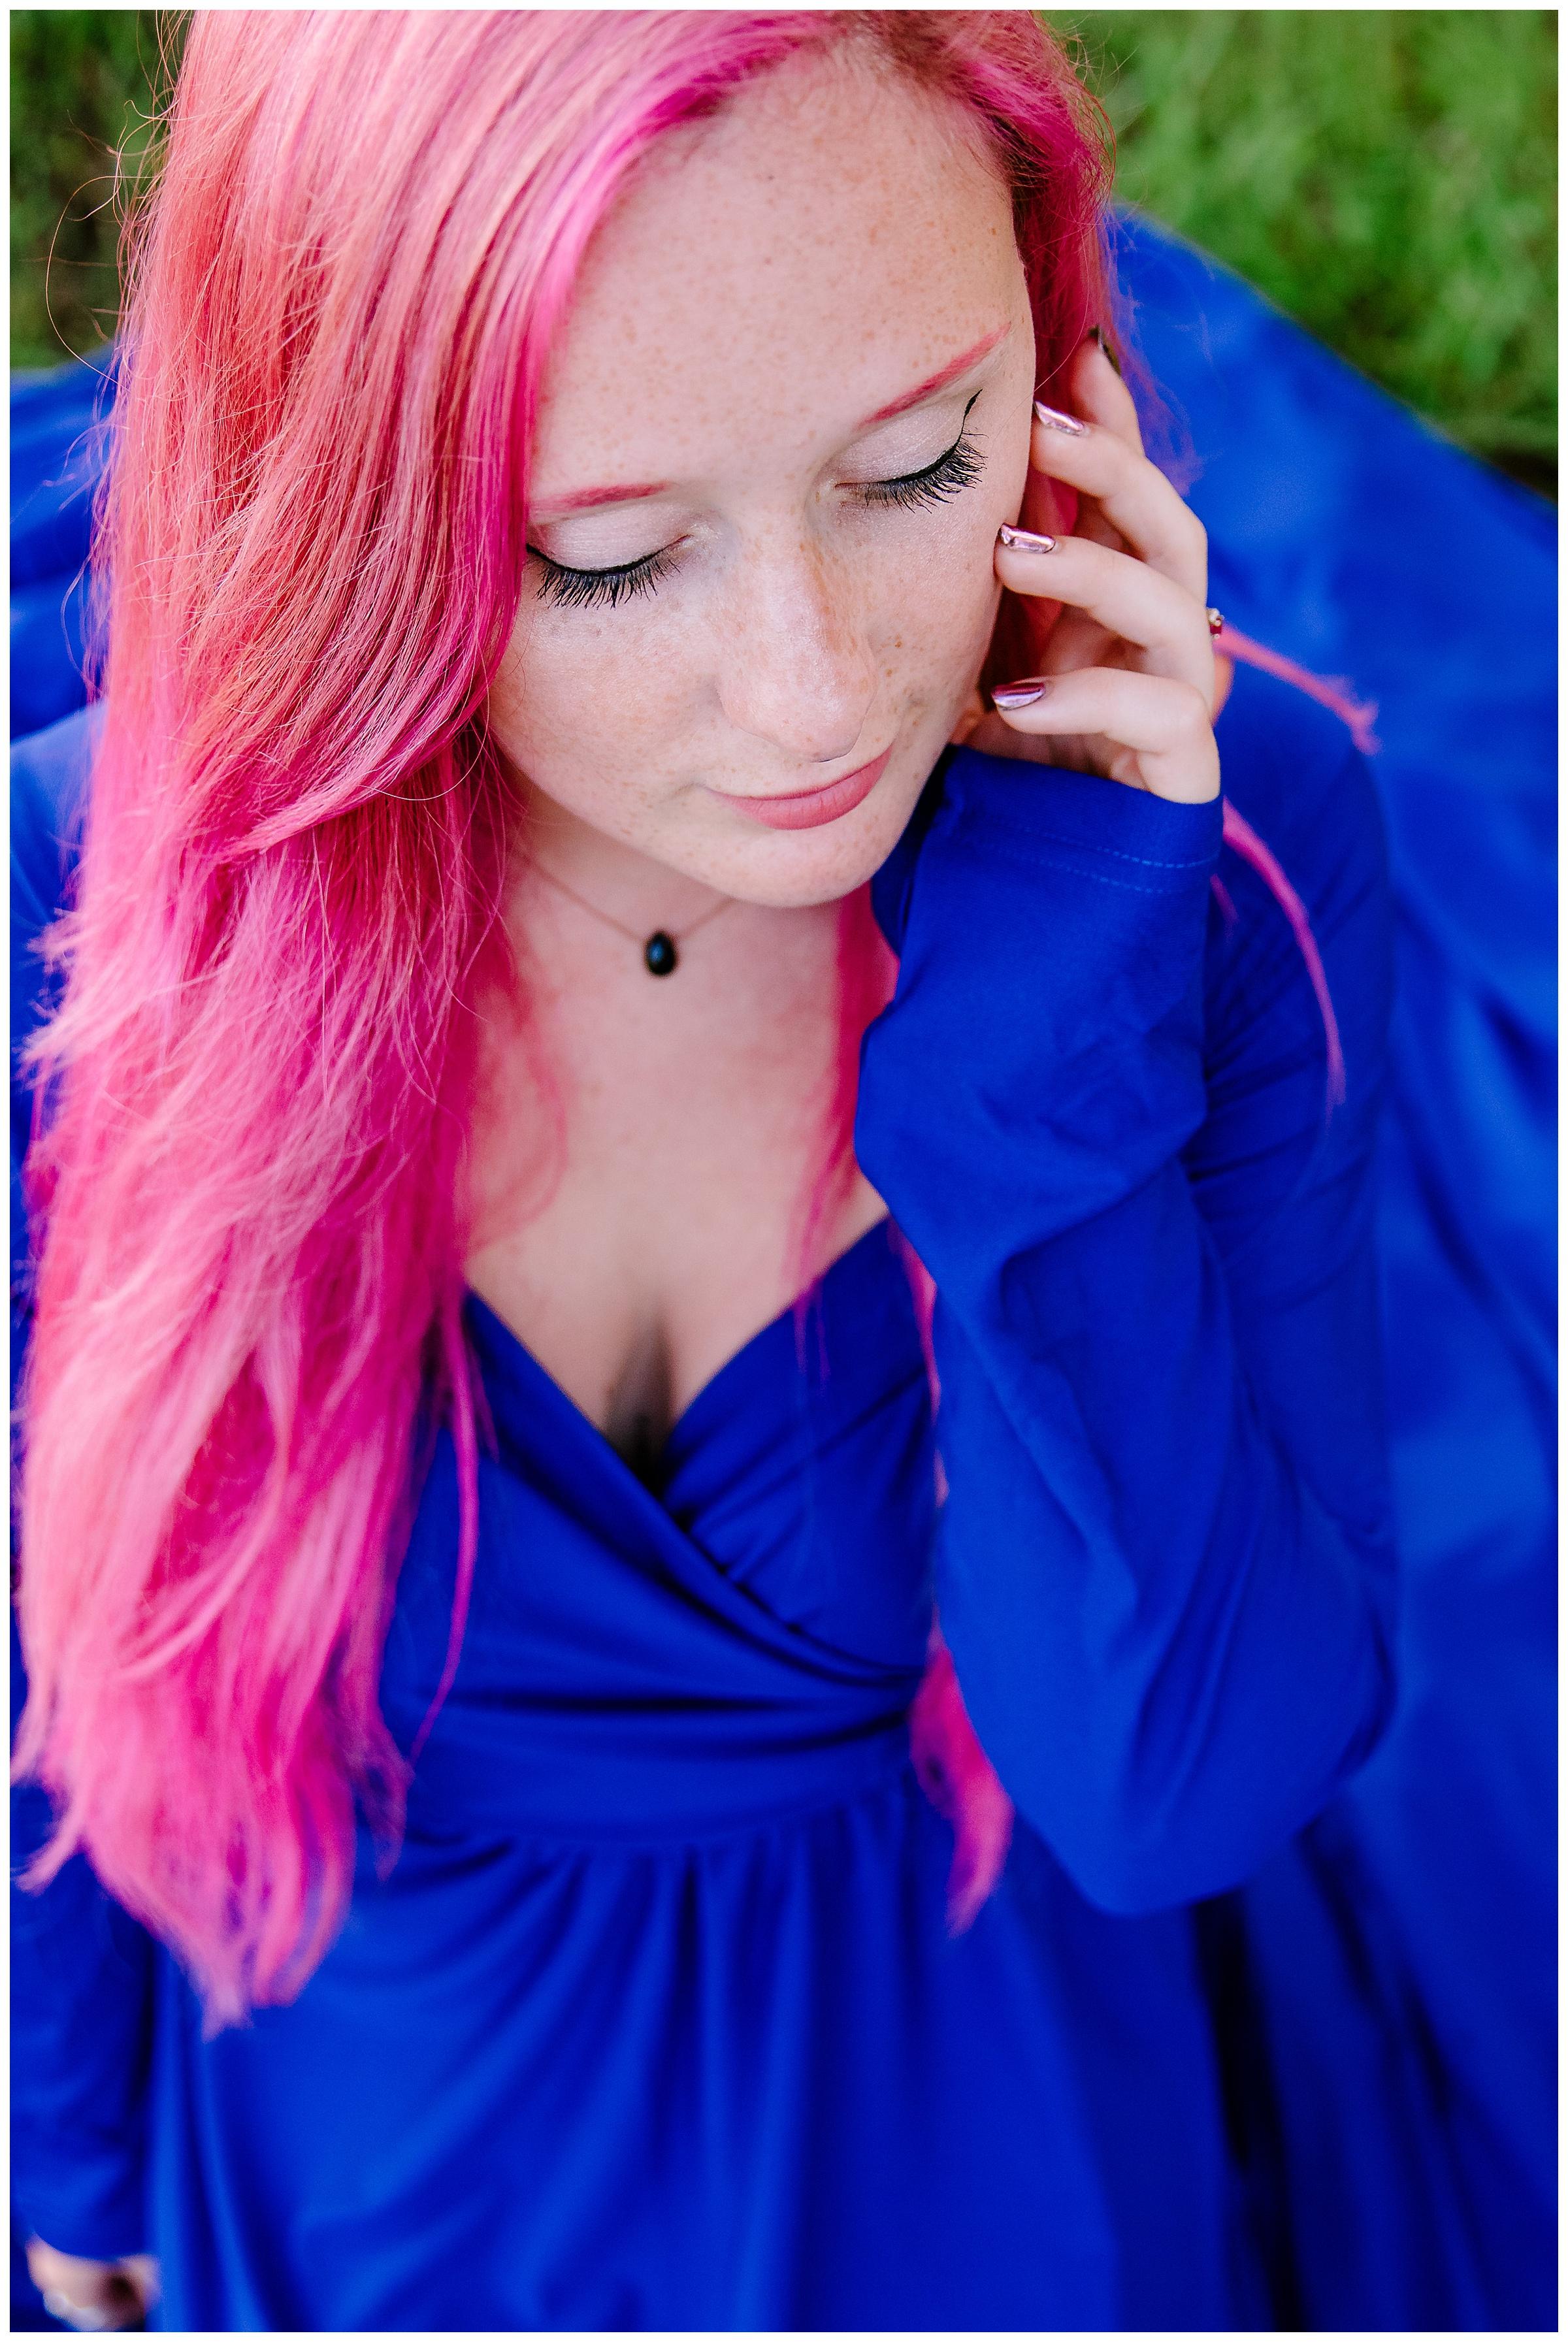 BLM,Brianna Morrissey,Brie Morrissey,Cricket Hill Farm,Flower Crown,Headshot,Jun,June,Madelynne Moynihan,Madelynne Victoria Moynihan,Madelynne-Moynihan,Nature Portrait,Outdoor Portrait,Personal Work,Photo,Photographer,Photography,Pink Hair,Portrait,www.blmphoto.com/contact,©BLM Photography 2019,